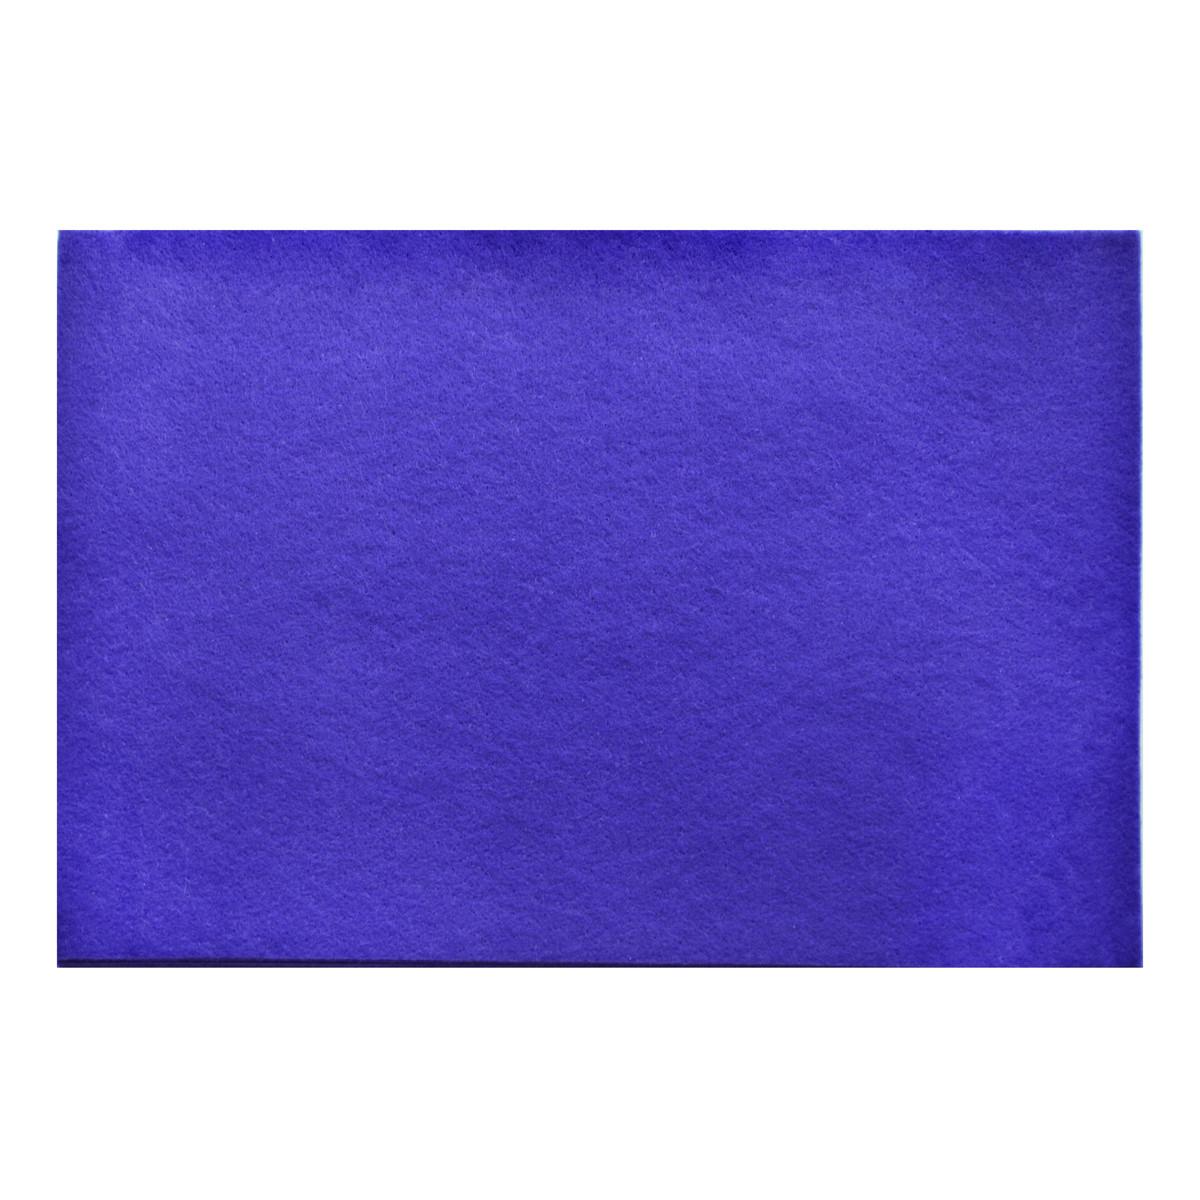 Набор Фетр Santi мягкий, темно-фиолетовый, 21*30см (10л) код: 741864